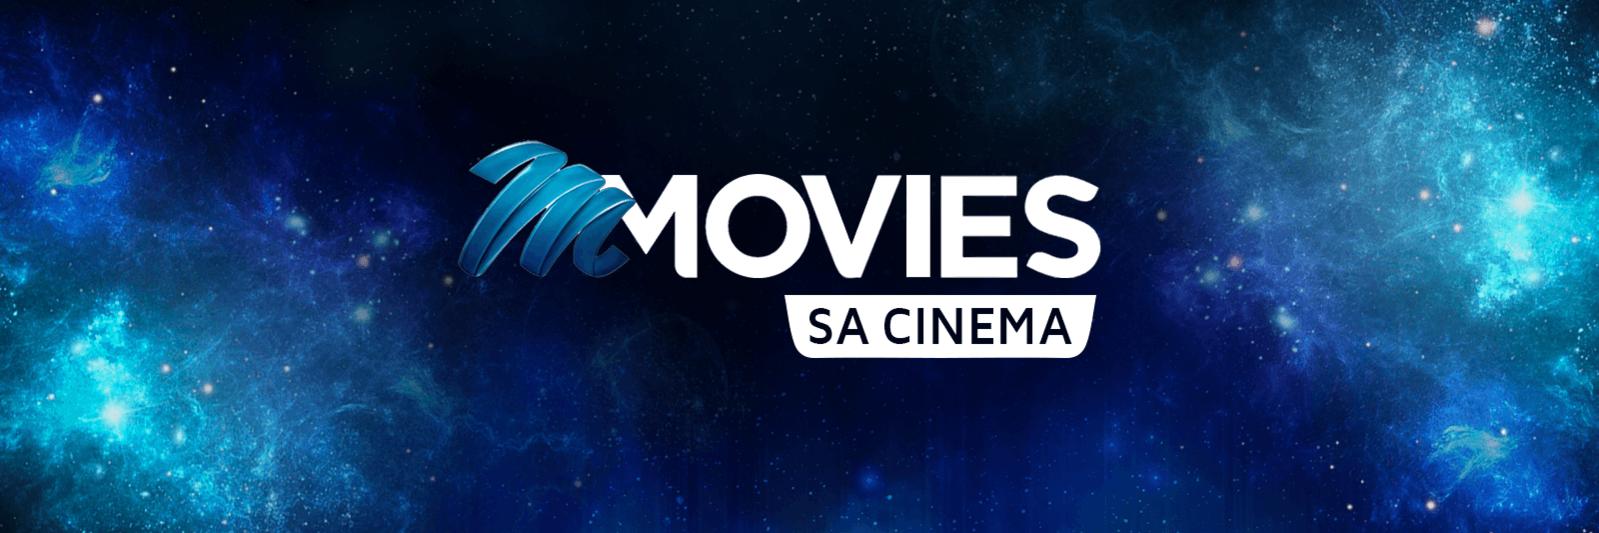 27 m net movies sa cinema billboard 011 pre